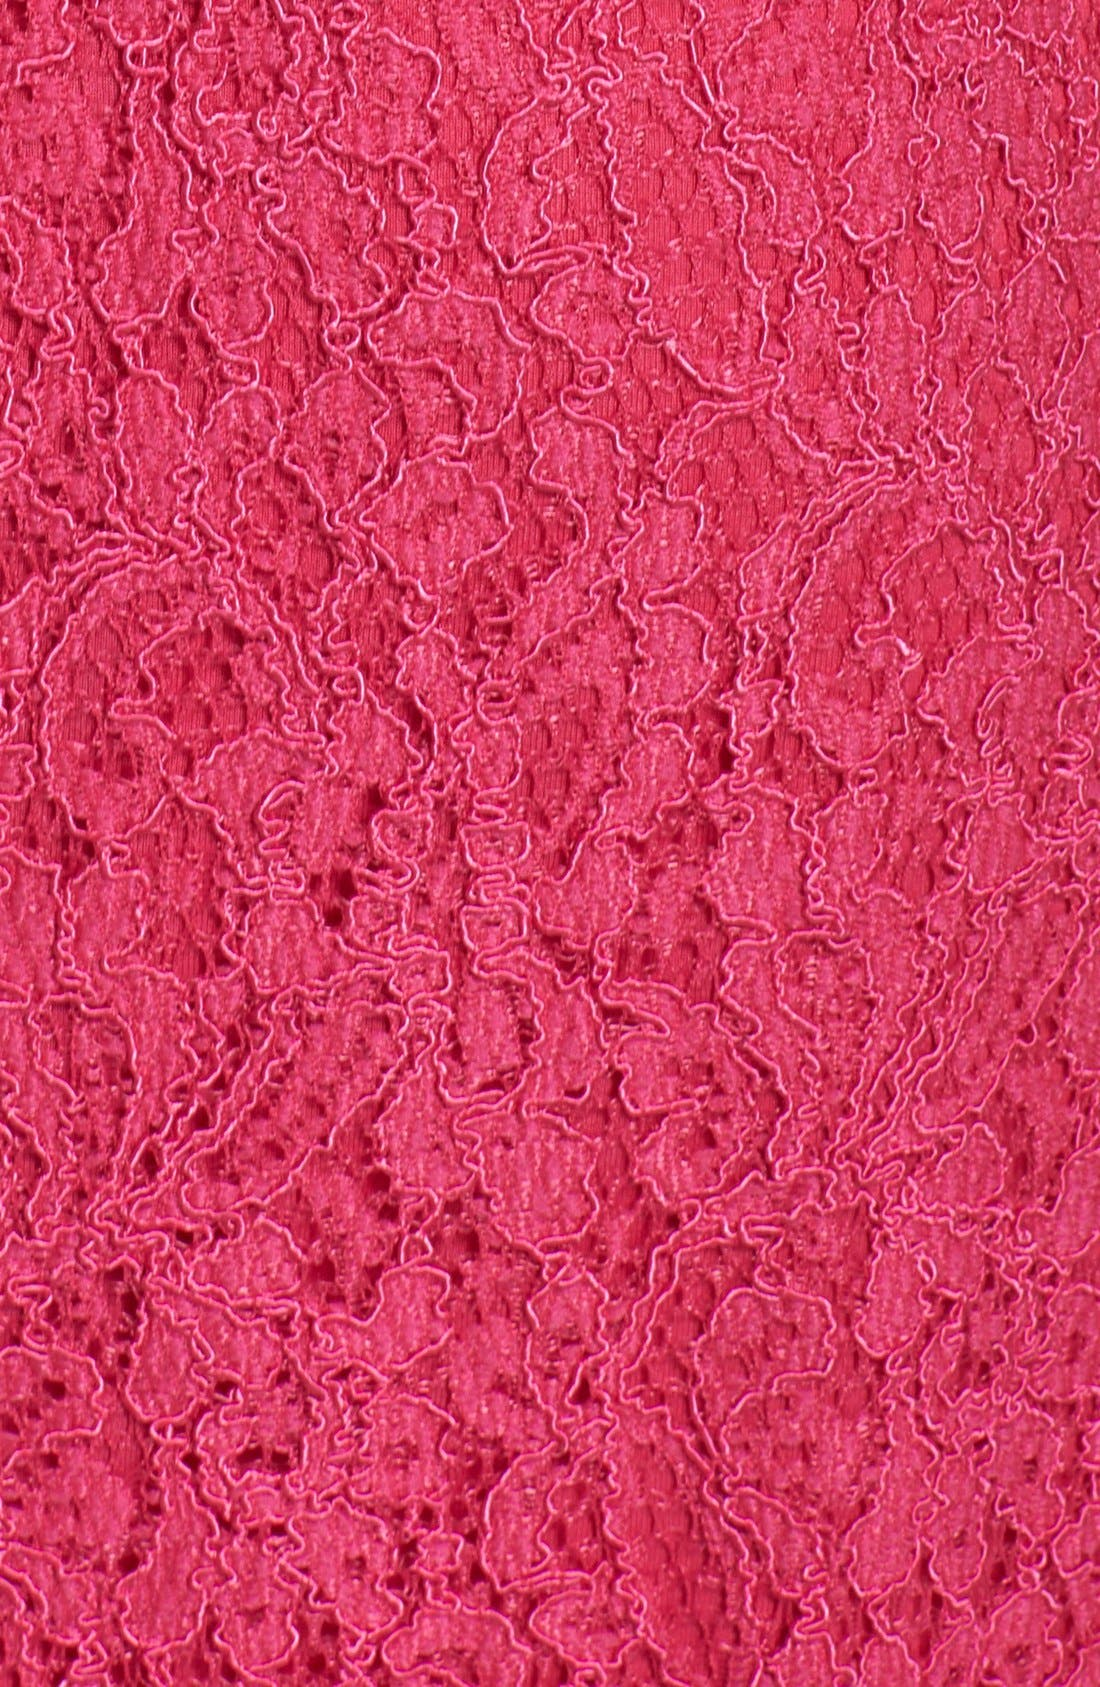 Boatneck Lace Sheath Dress,                             Alternate thumbnail 137, color,